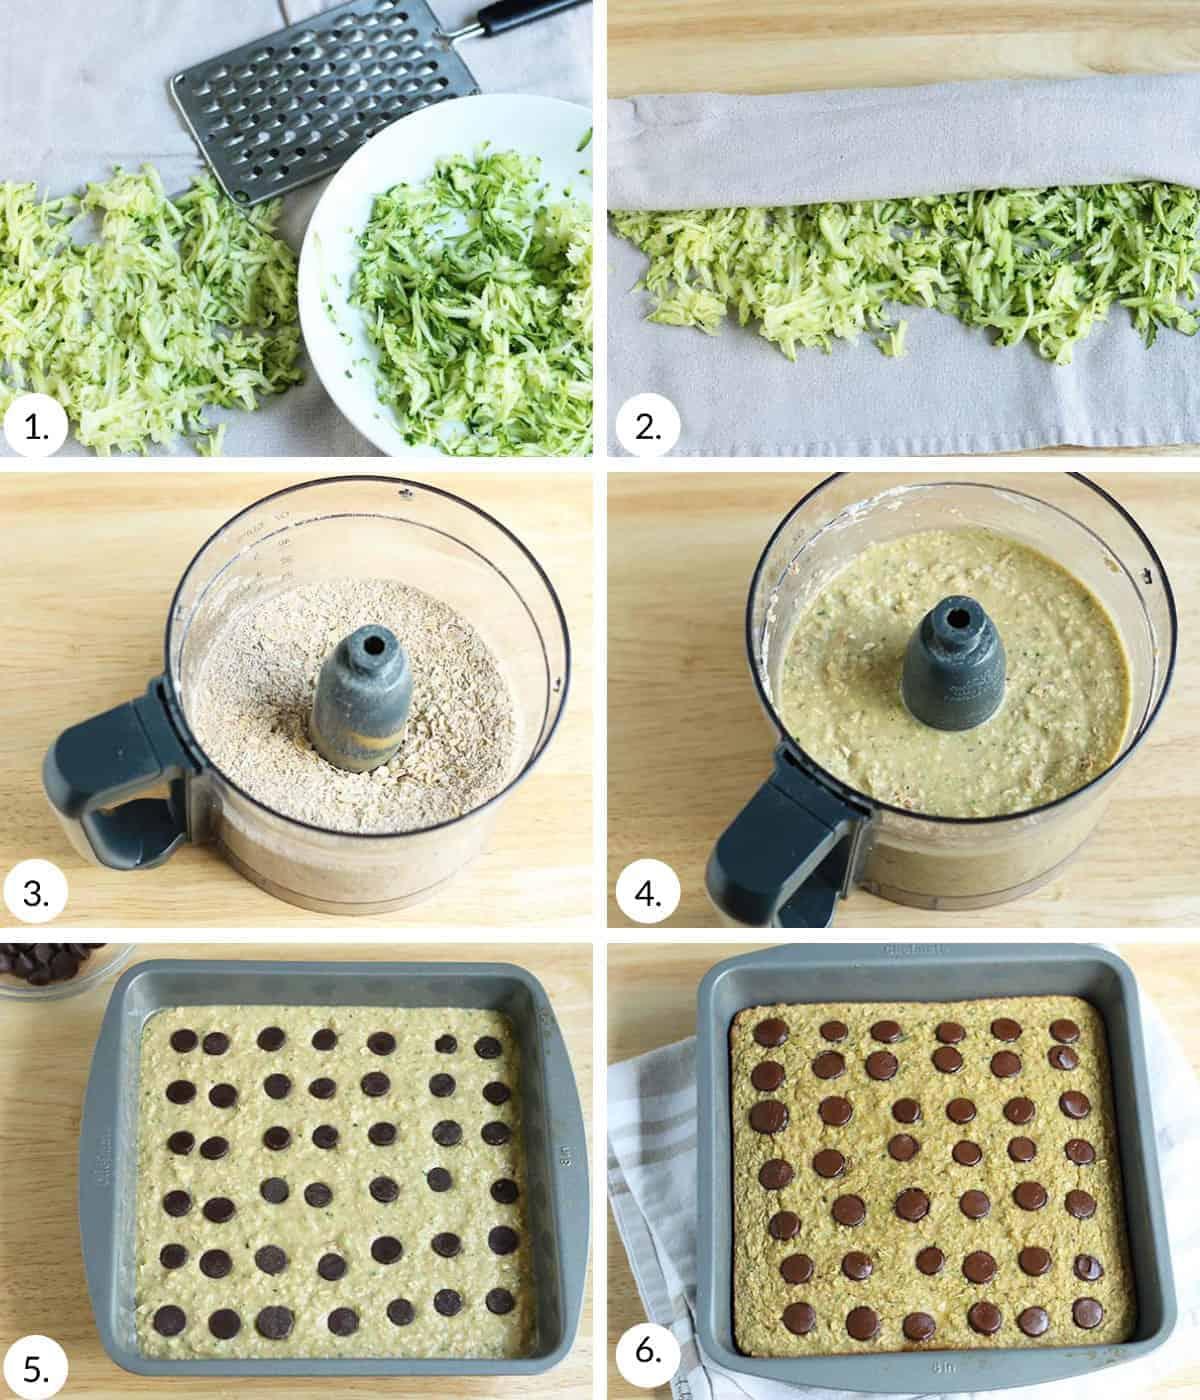 how-to-make-zucchini-banana-bread-step-by-step